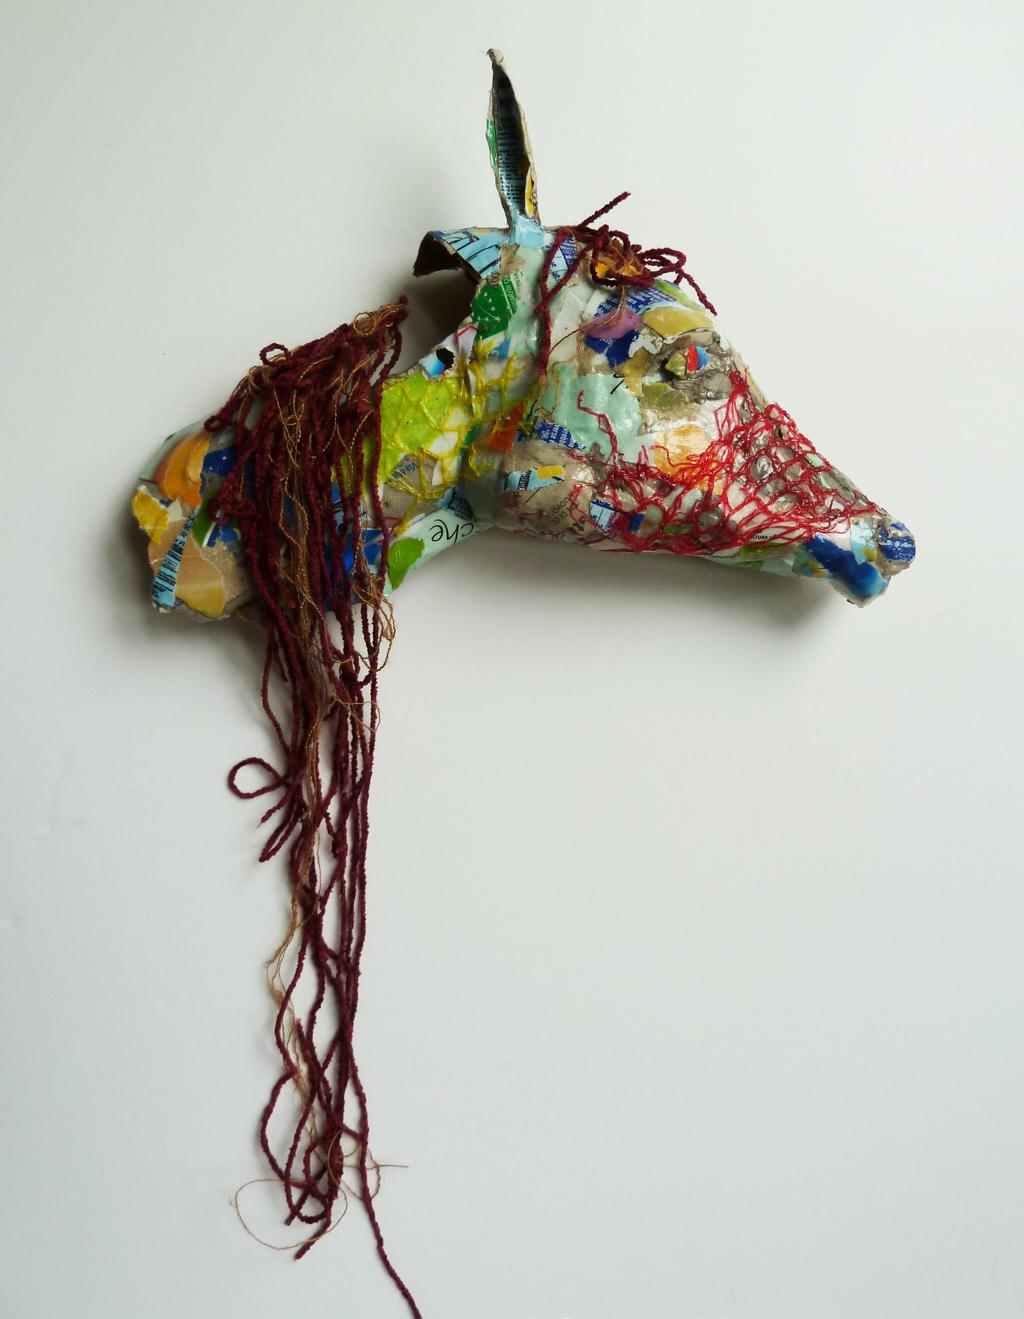 Horse by Yulia Shtern